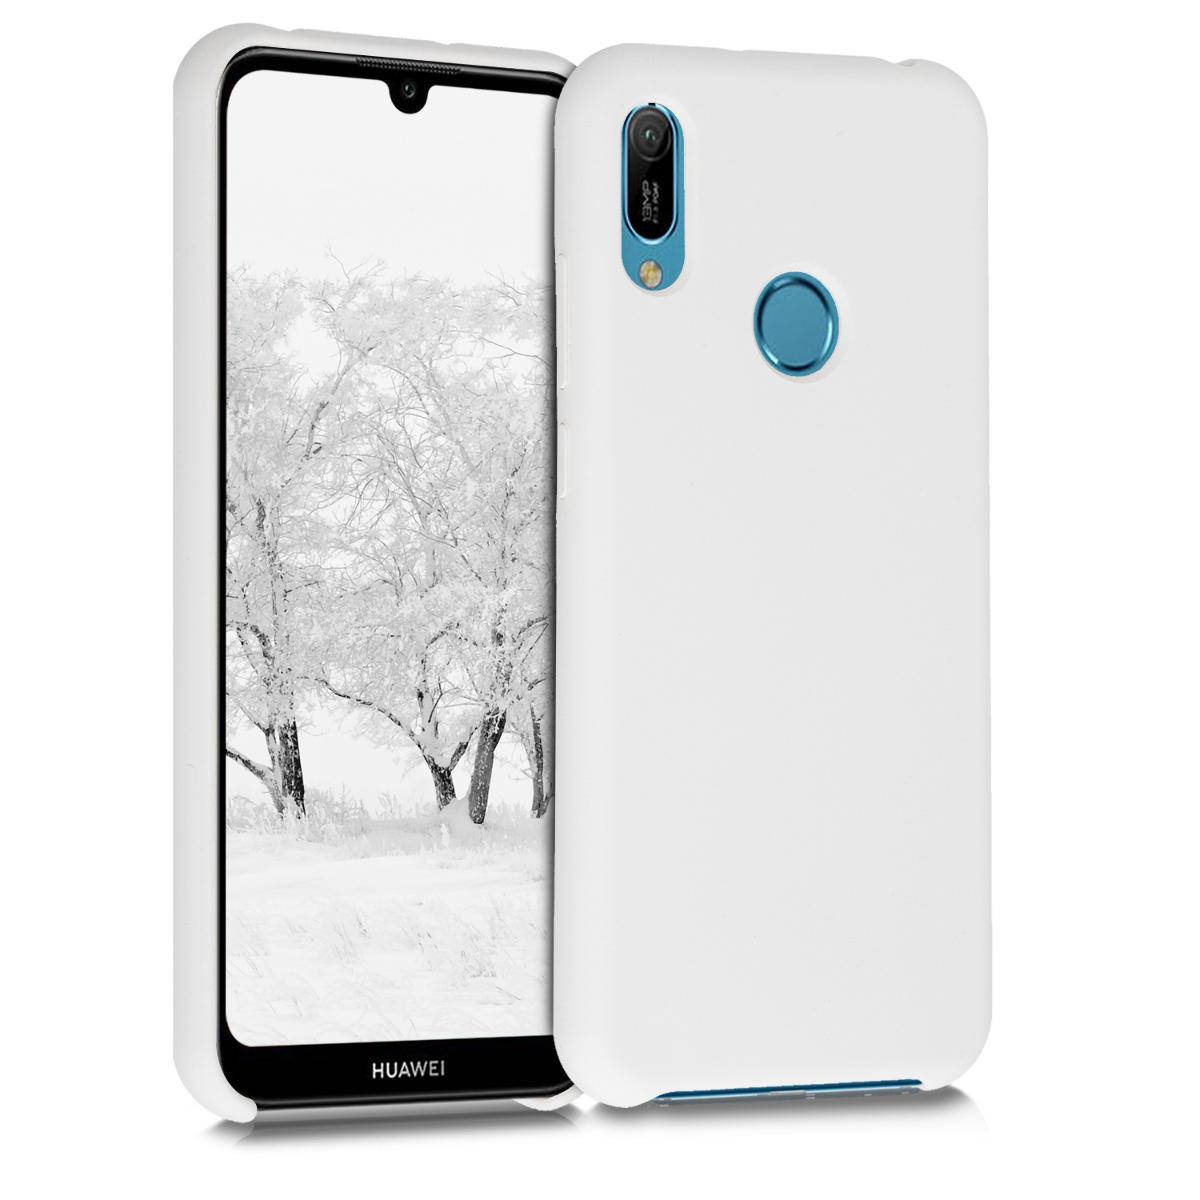 KW Θήκη Σιλικόνης Huawei Y6 2019 - Soft Flexible Rubber - White (50685.02)